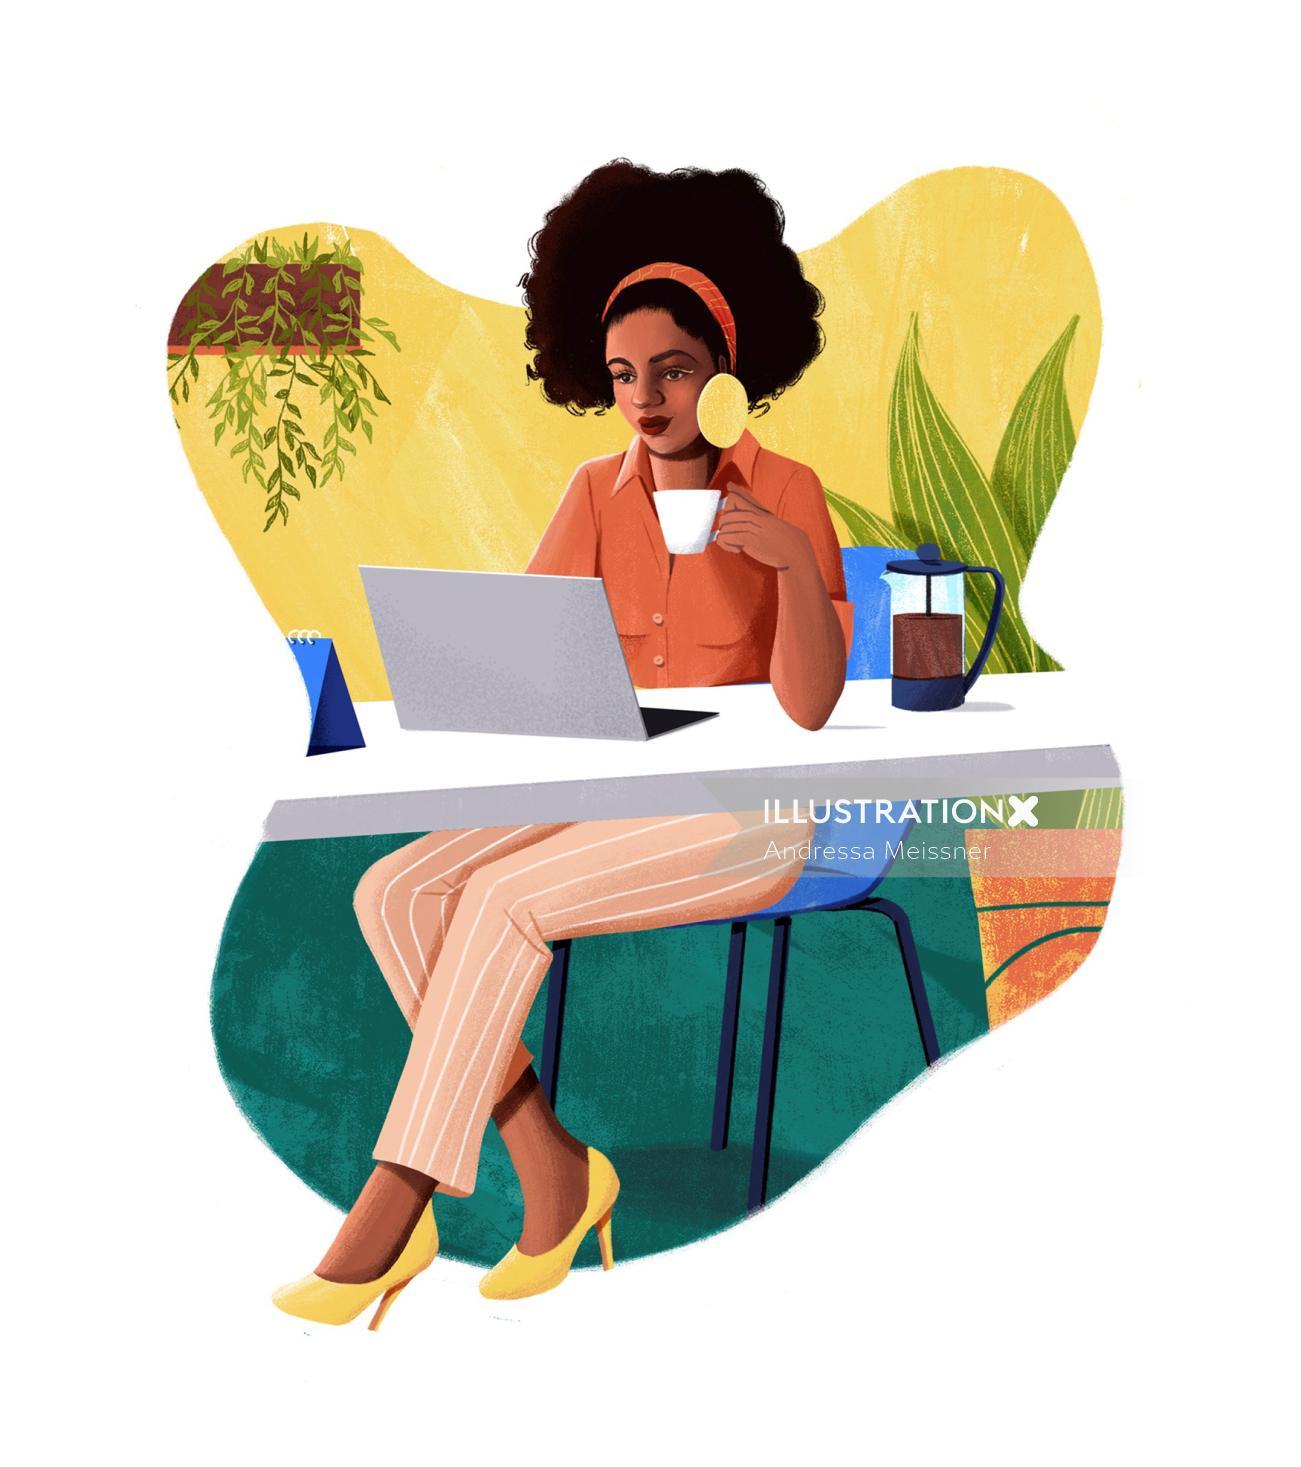 Home office illustration for Grão Gourmet website